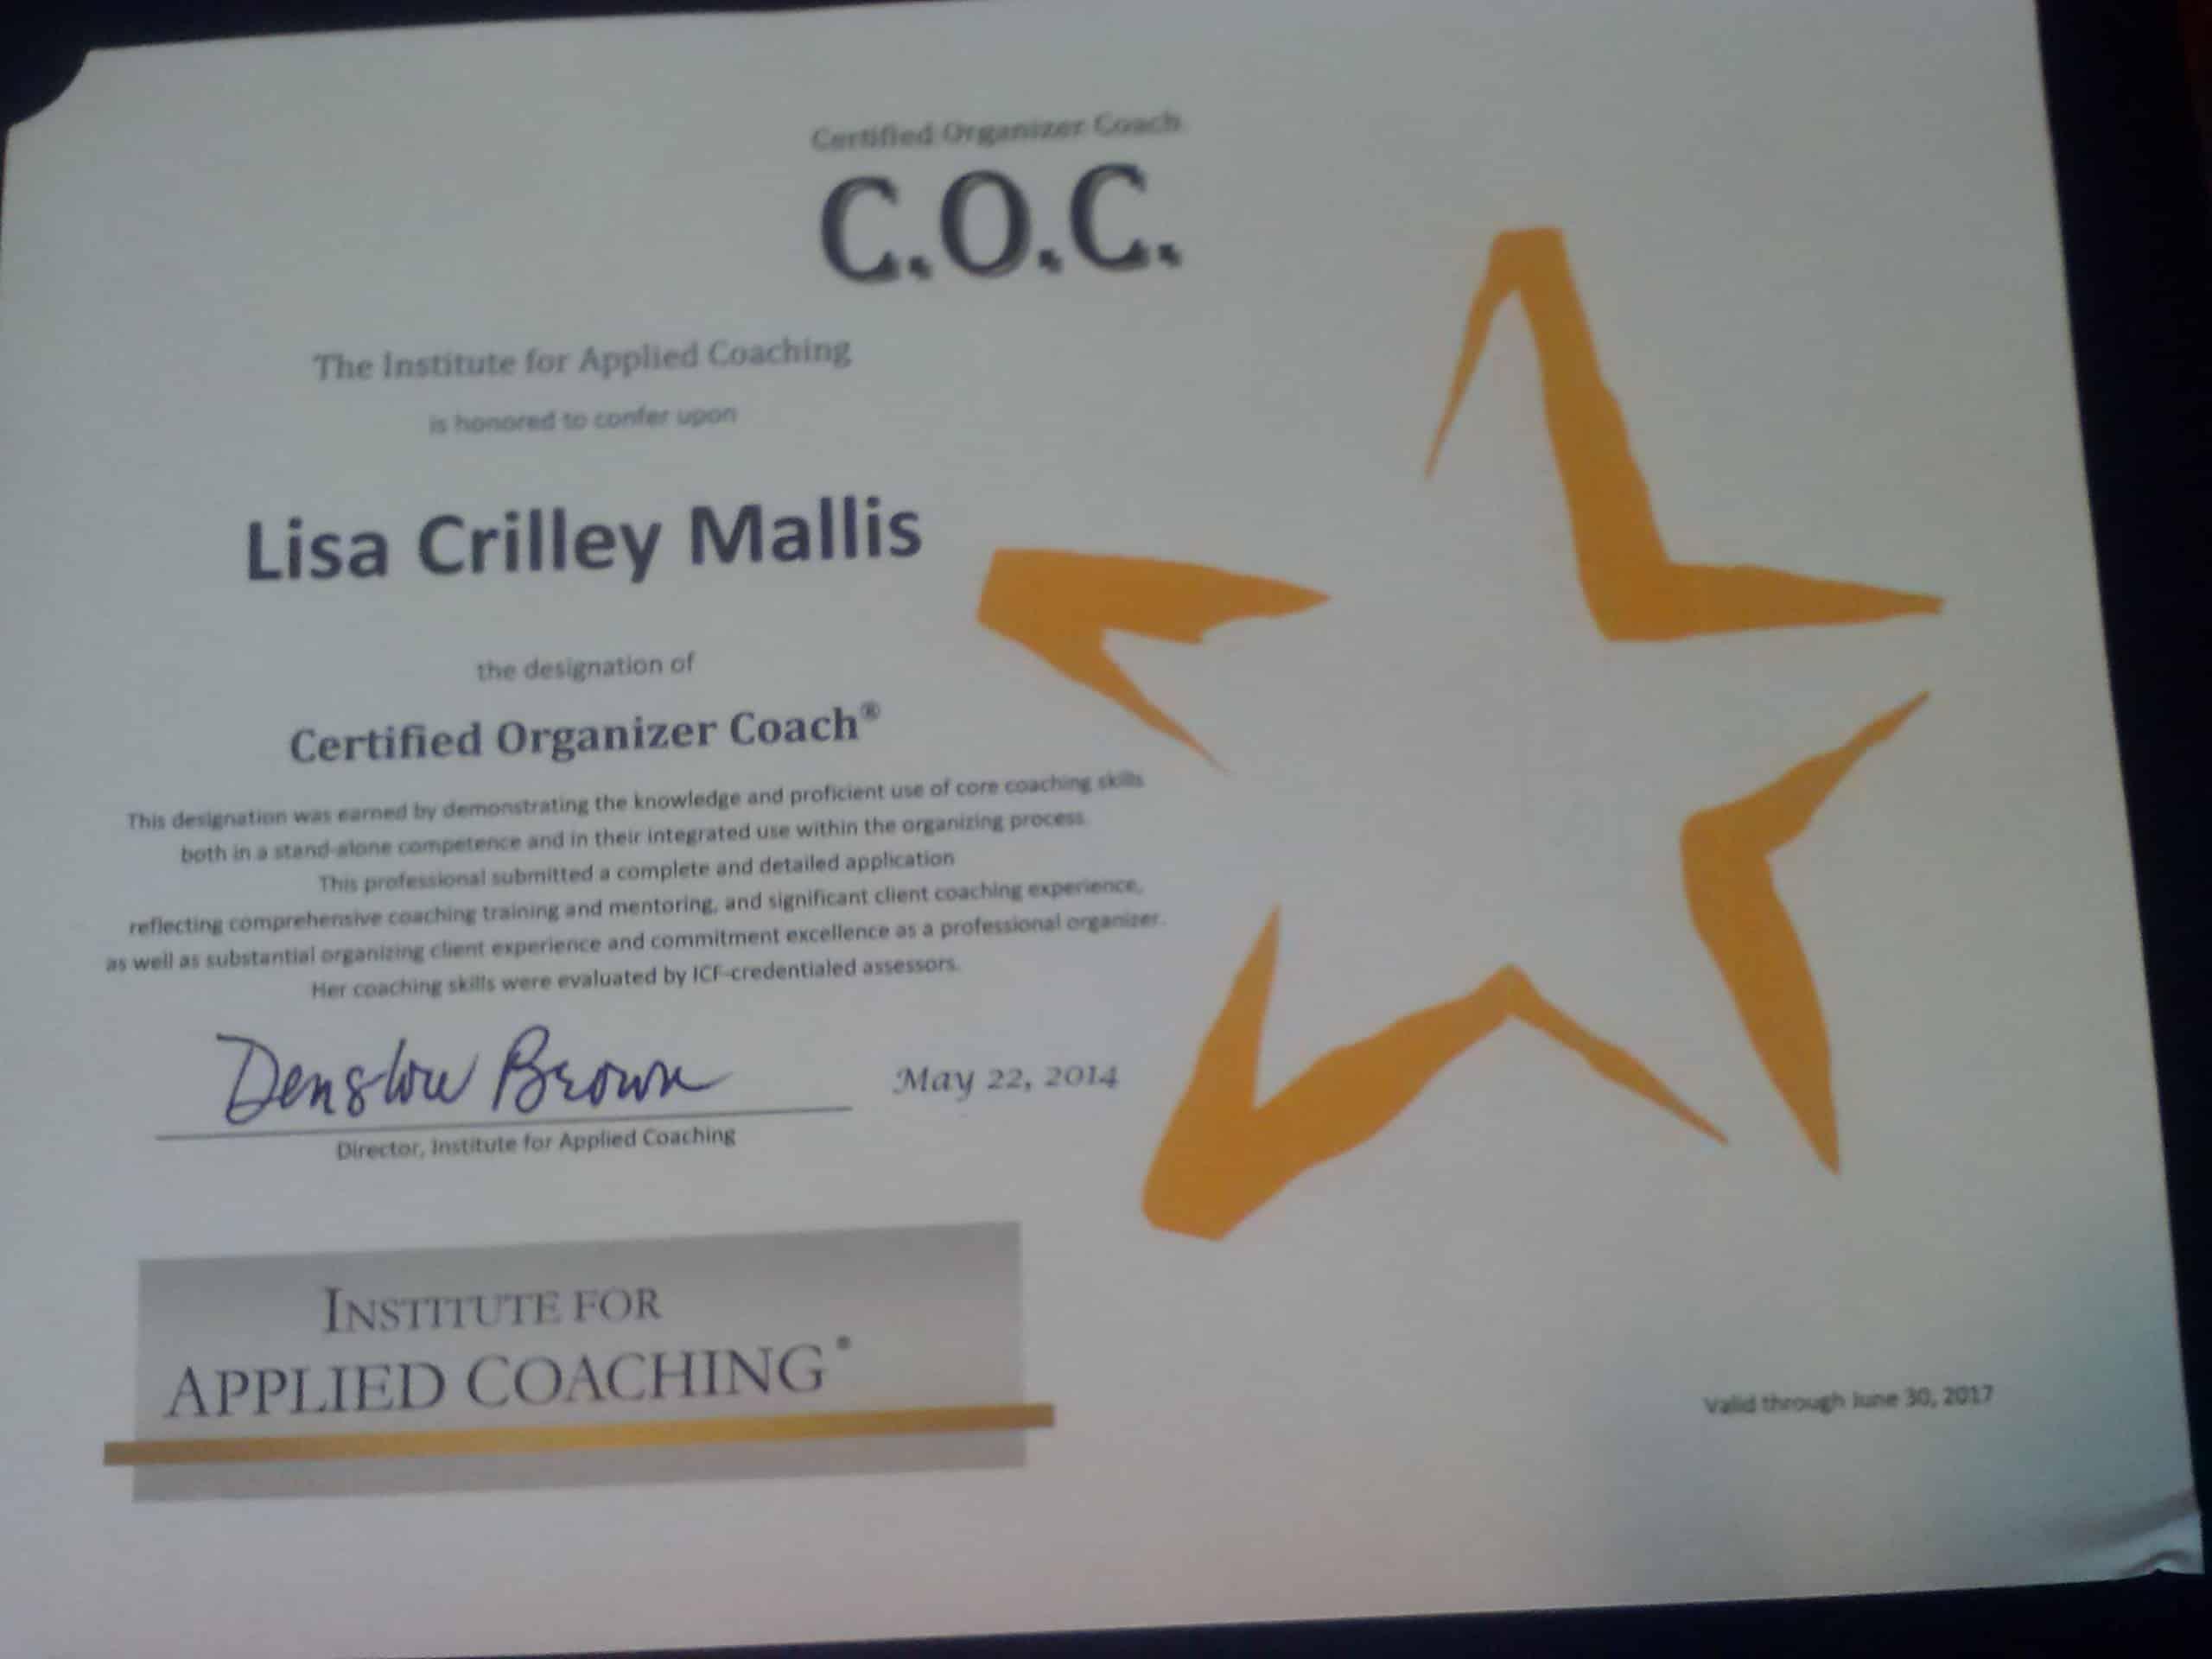 Lisa Crilley Mallis, COC